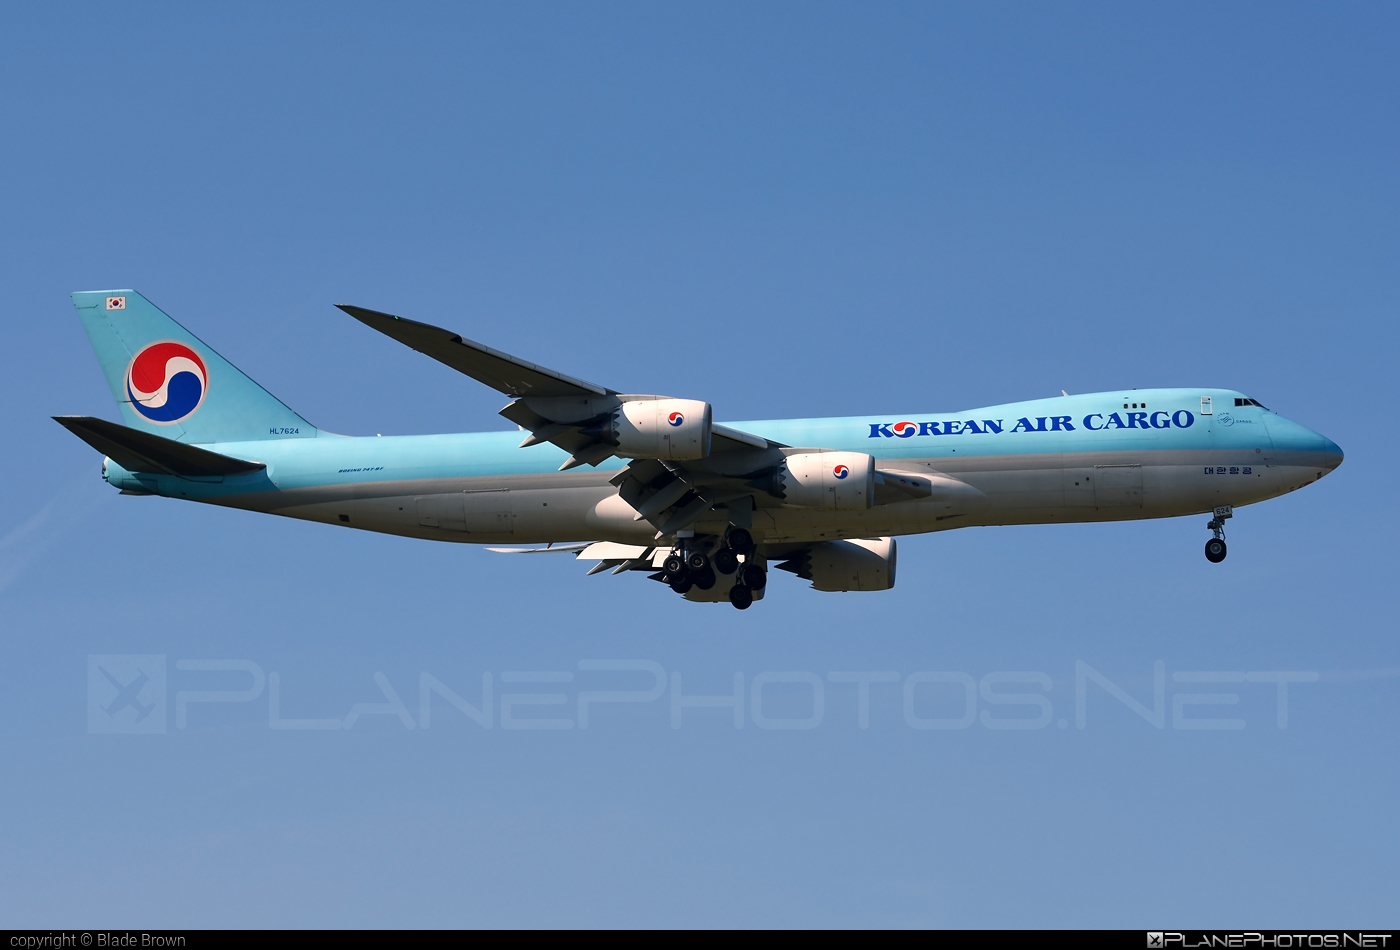 Korean Air Cargo Boeing 747-8F - HL7624 #b747 #b747f #b747freighter #boeing #boeing747 #jumbo #koreanair #koreanaircargo